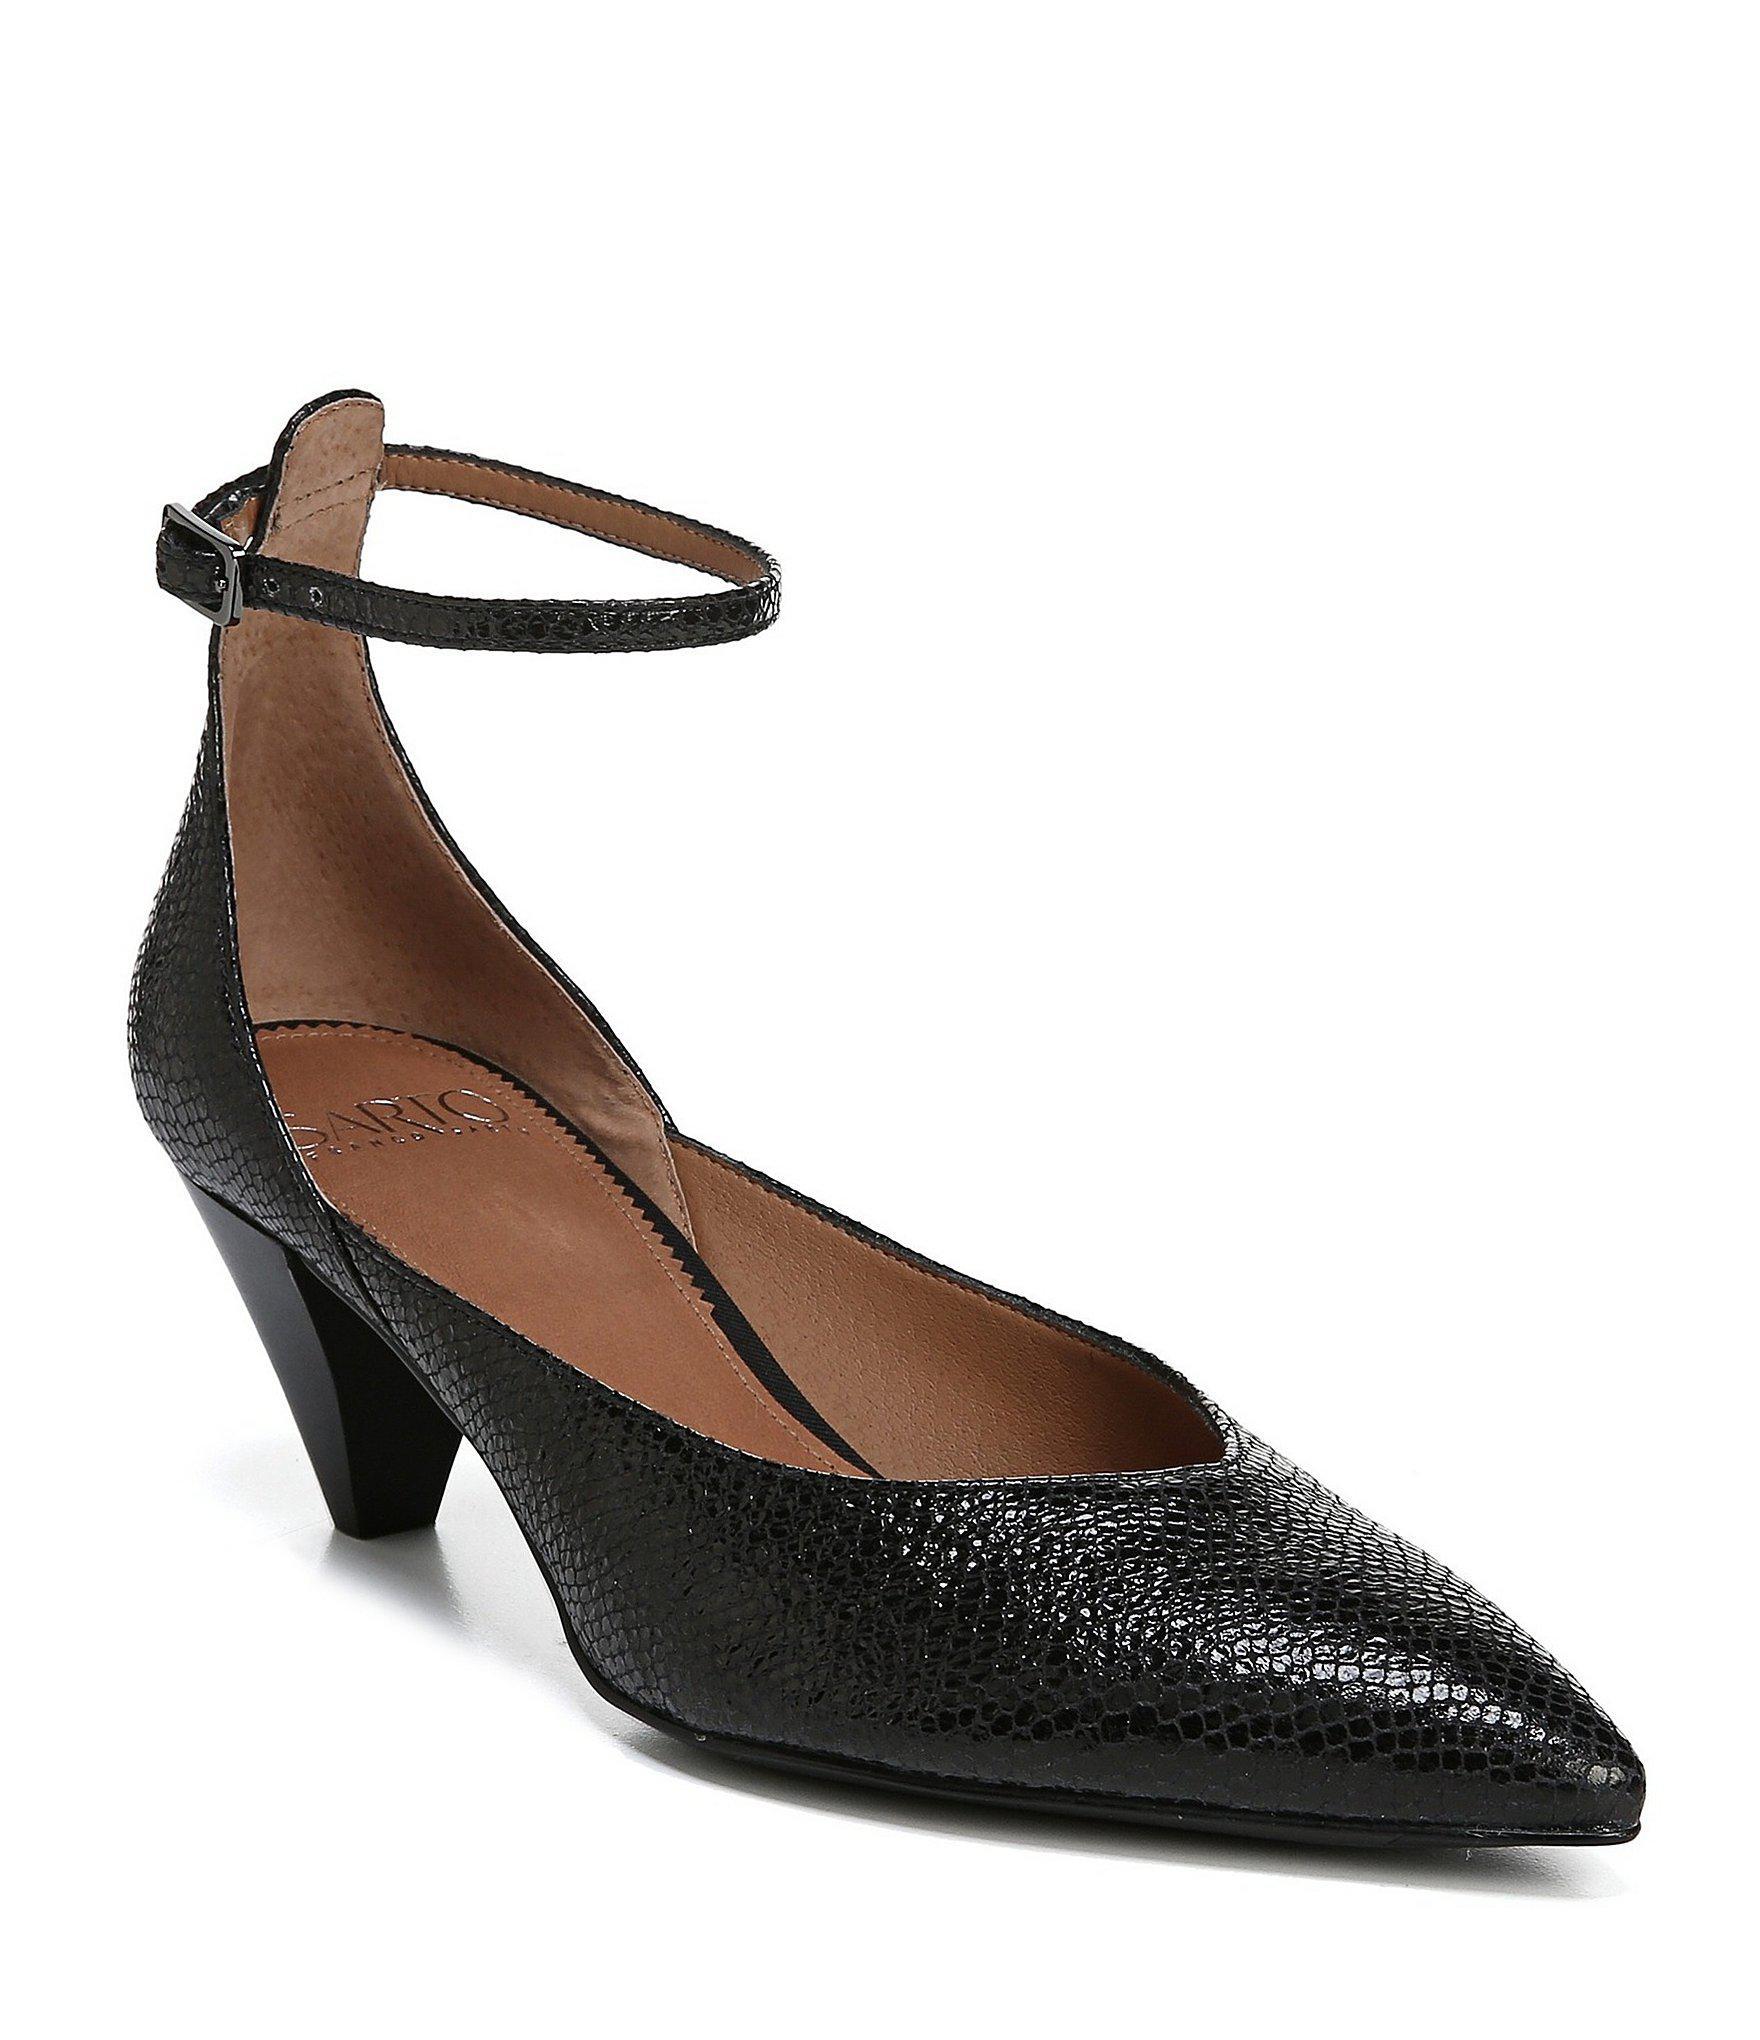 c9f5dba34ff00 Franco Sarto Sarto By Coralie Ankle Strap Leather Pumps in Black - Lyst